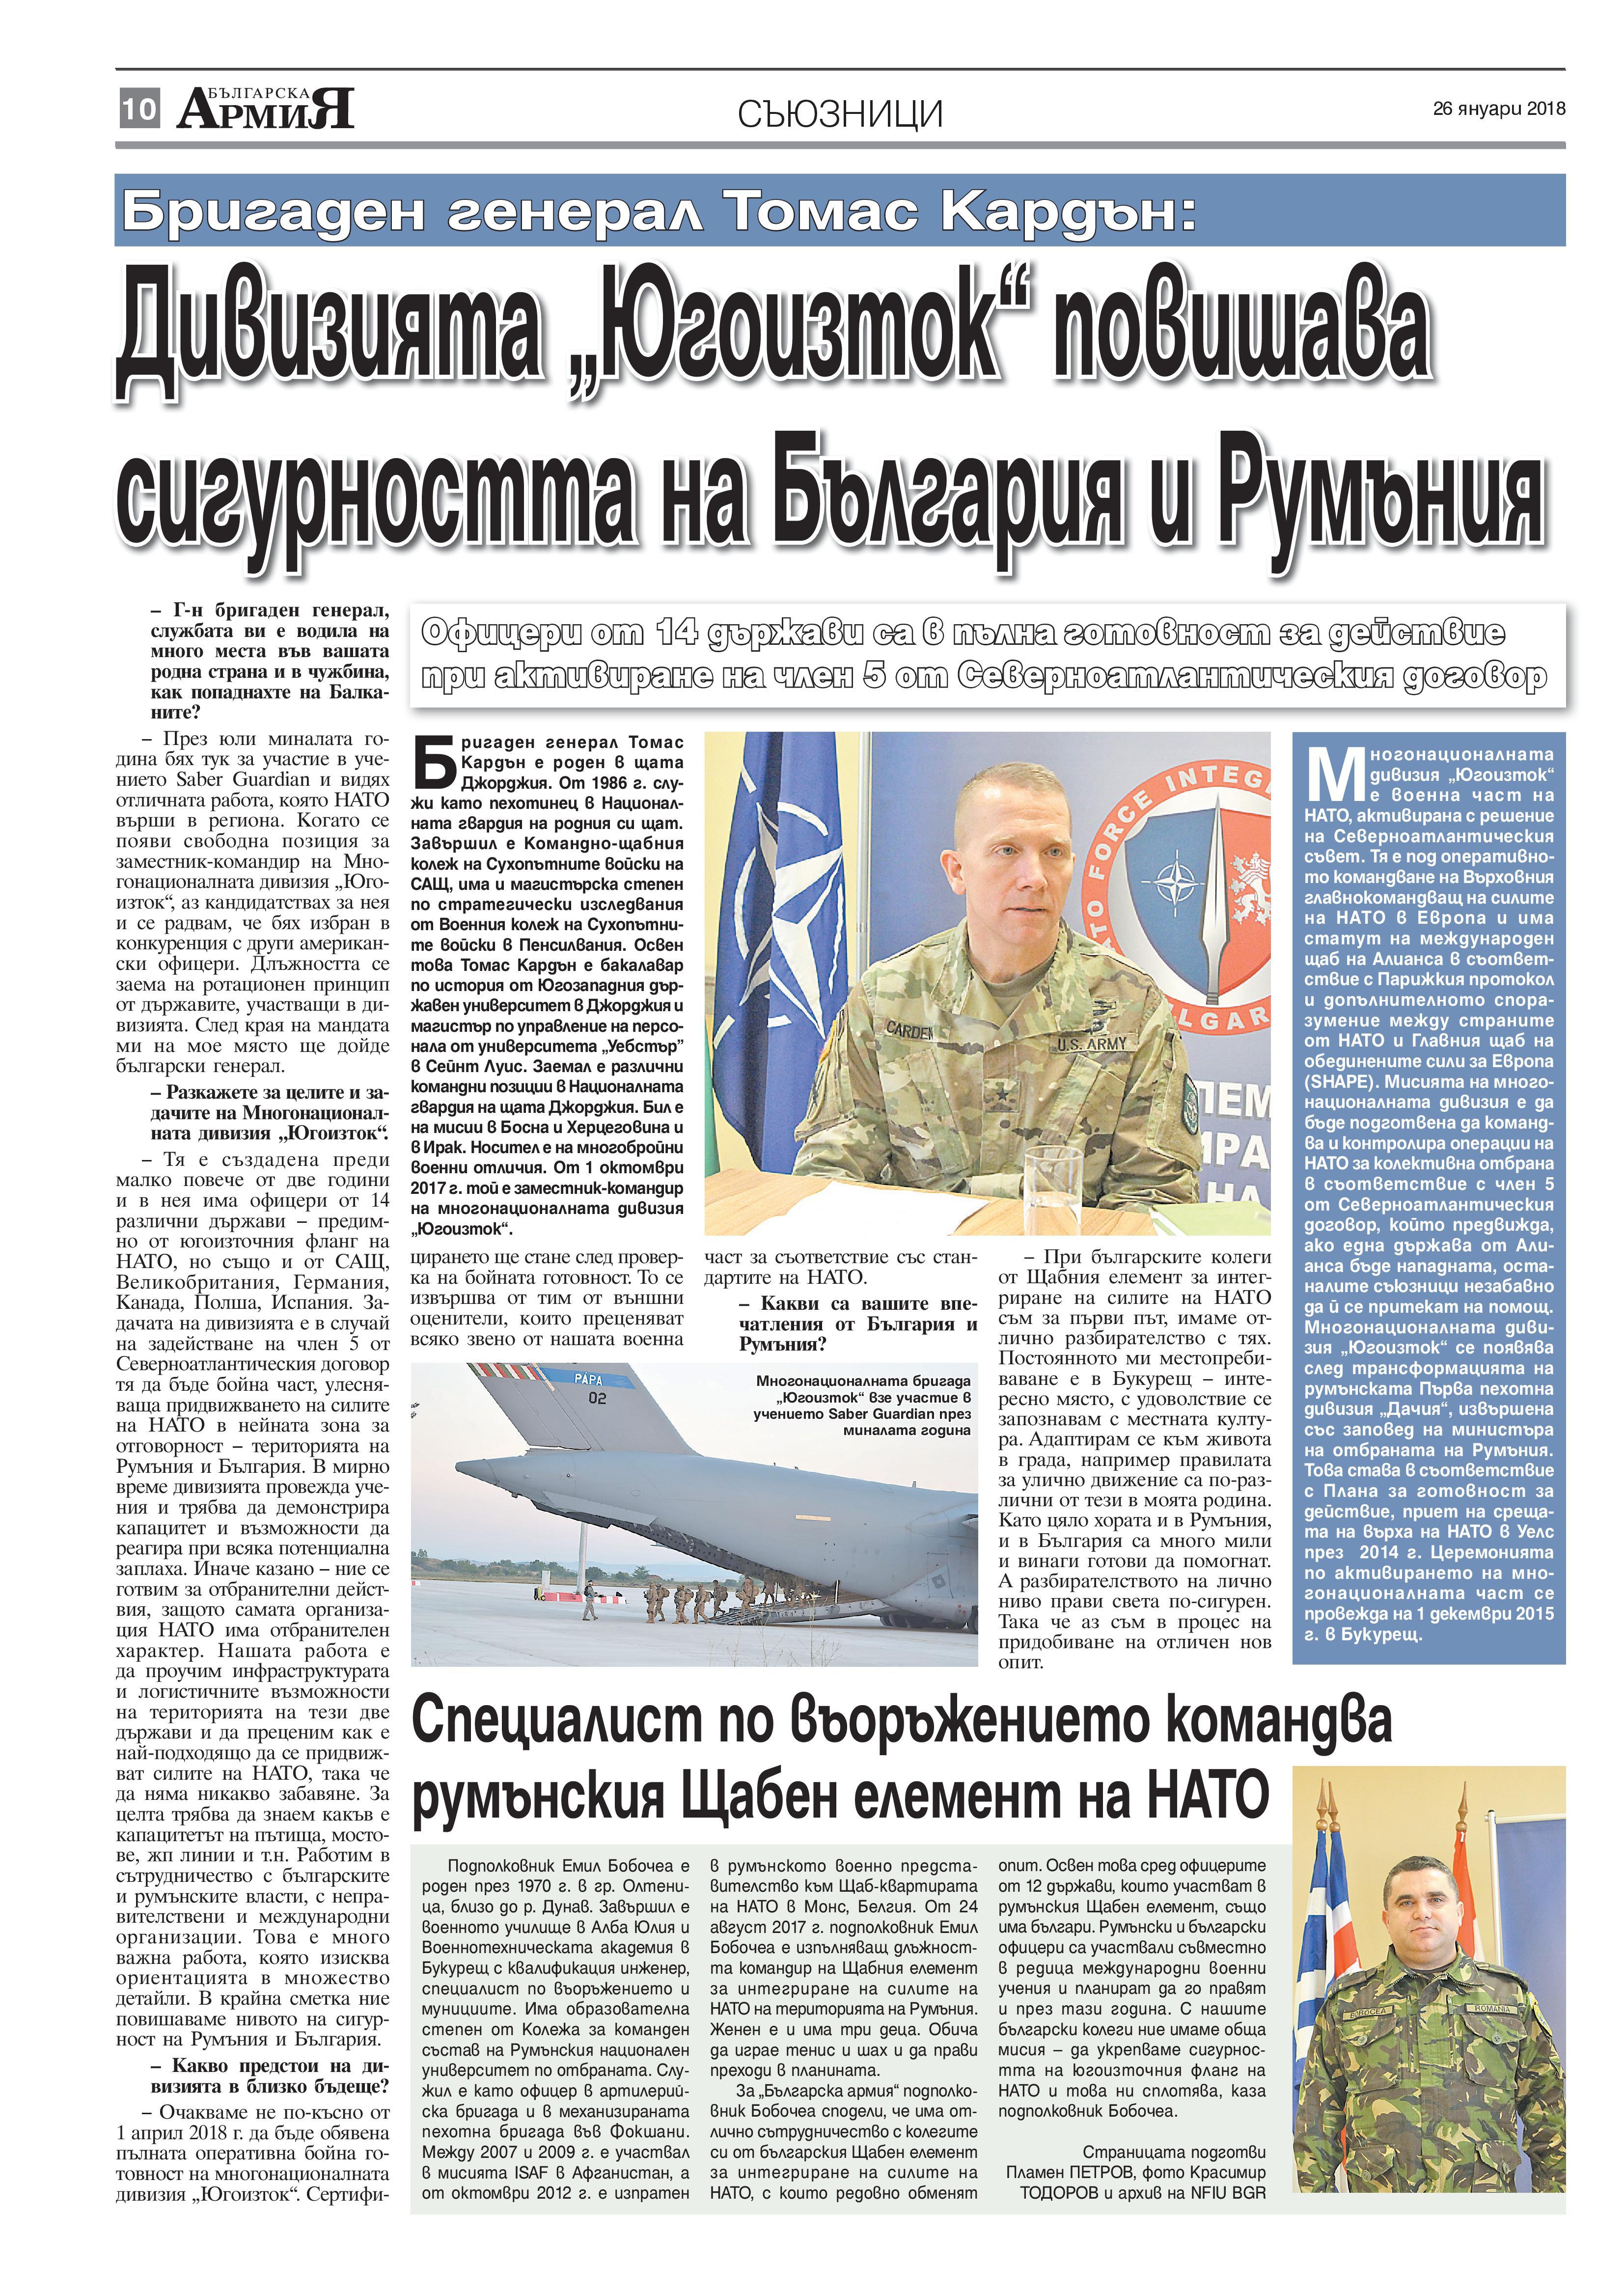 http://armymedia.bg/wp-content/uploads/2015/06/10-18.jpg